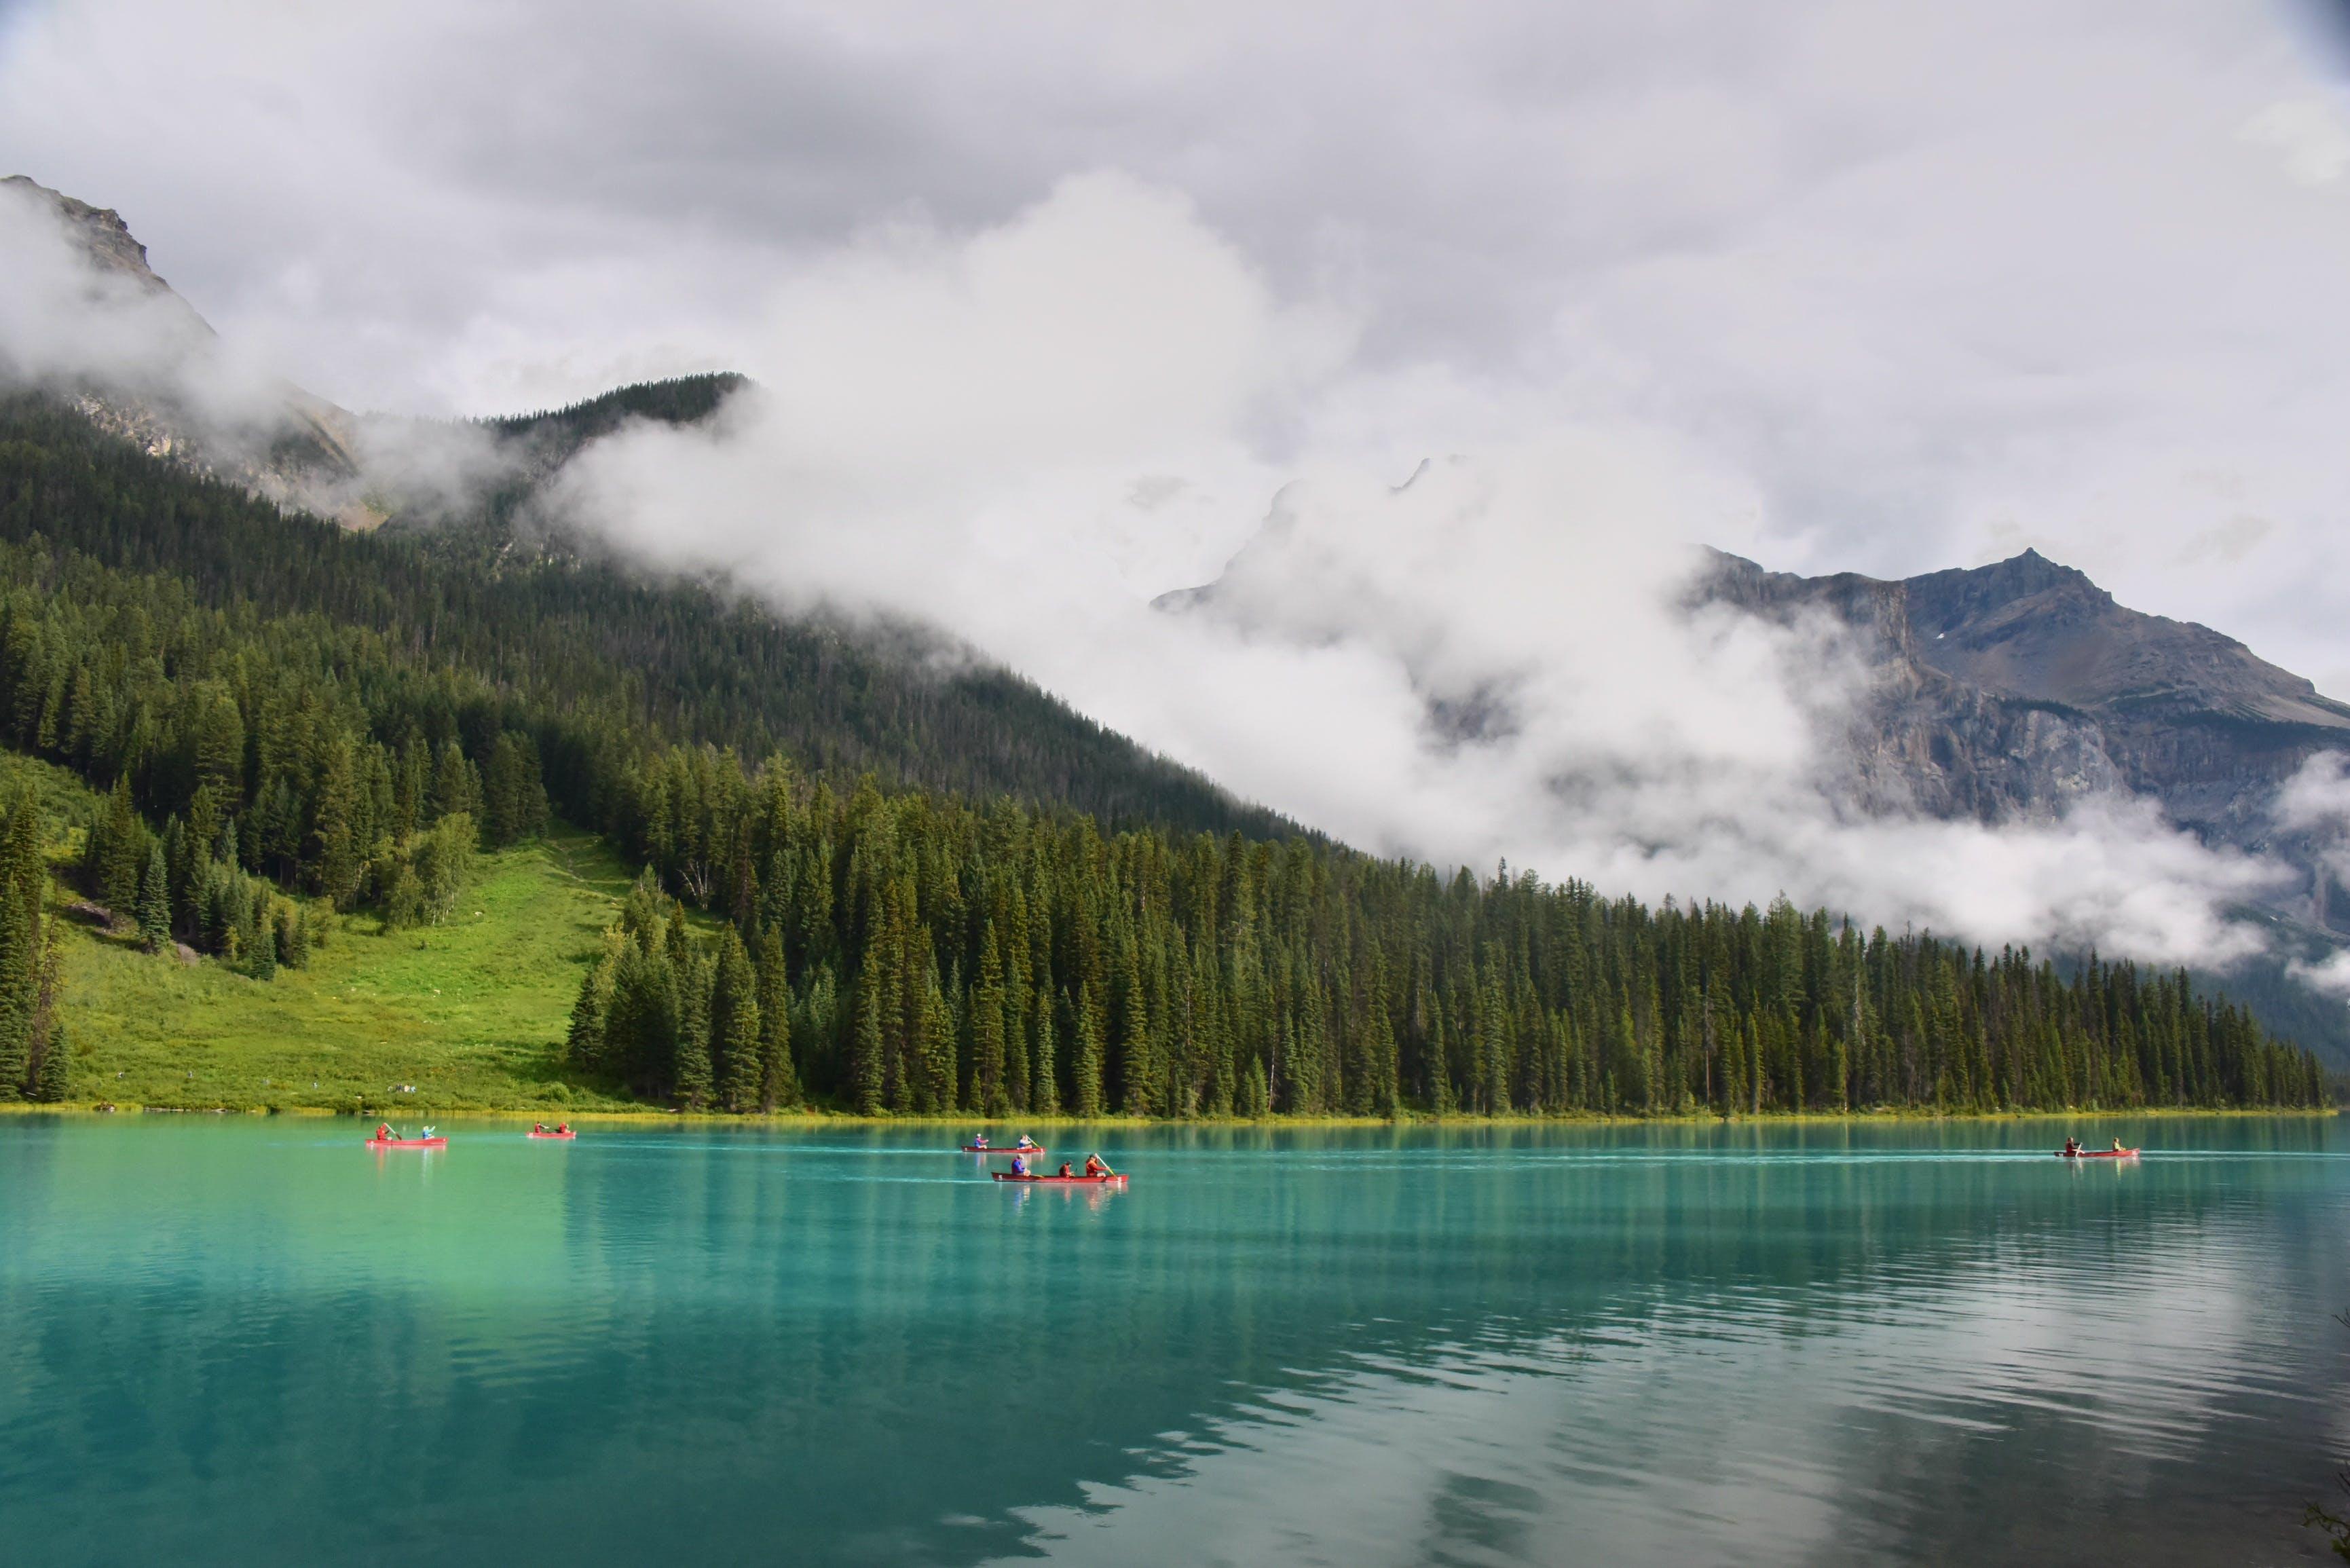 People Riding Boat on Lake · Free Stock Photo